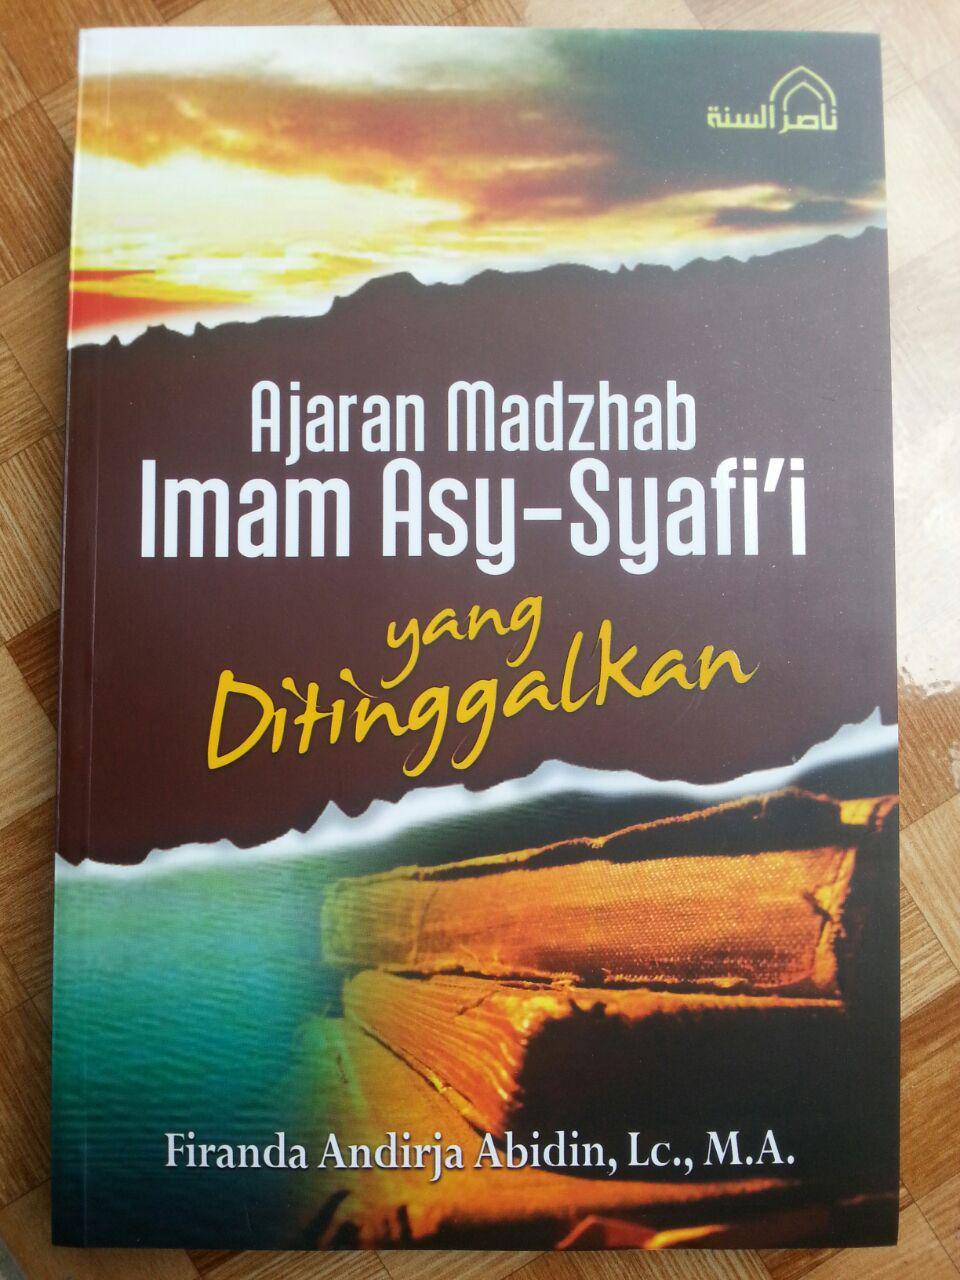 Buku Ajaran Madzhab Imam Asy-Syafii Yang Ditinggalkan cover 2